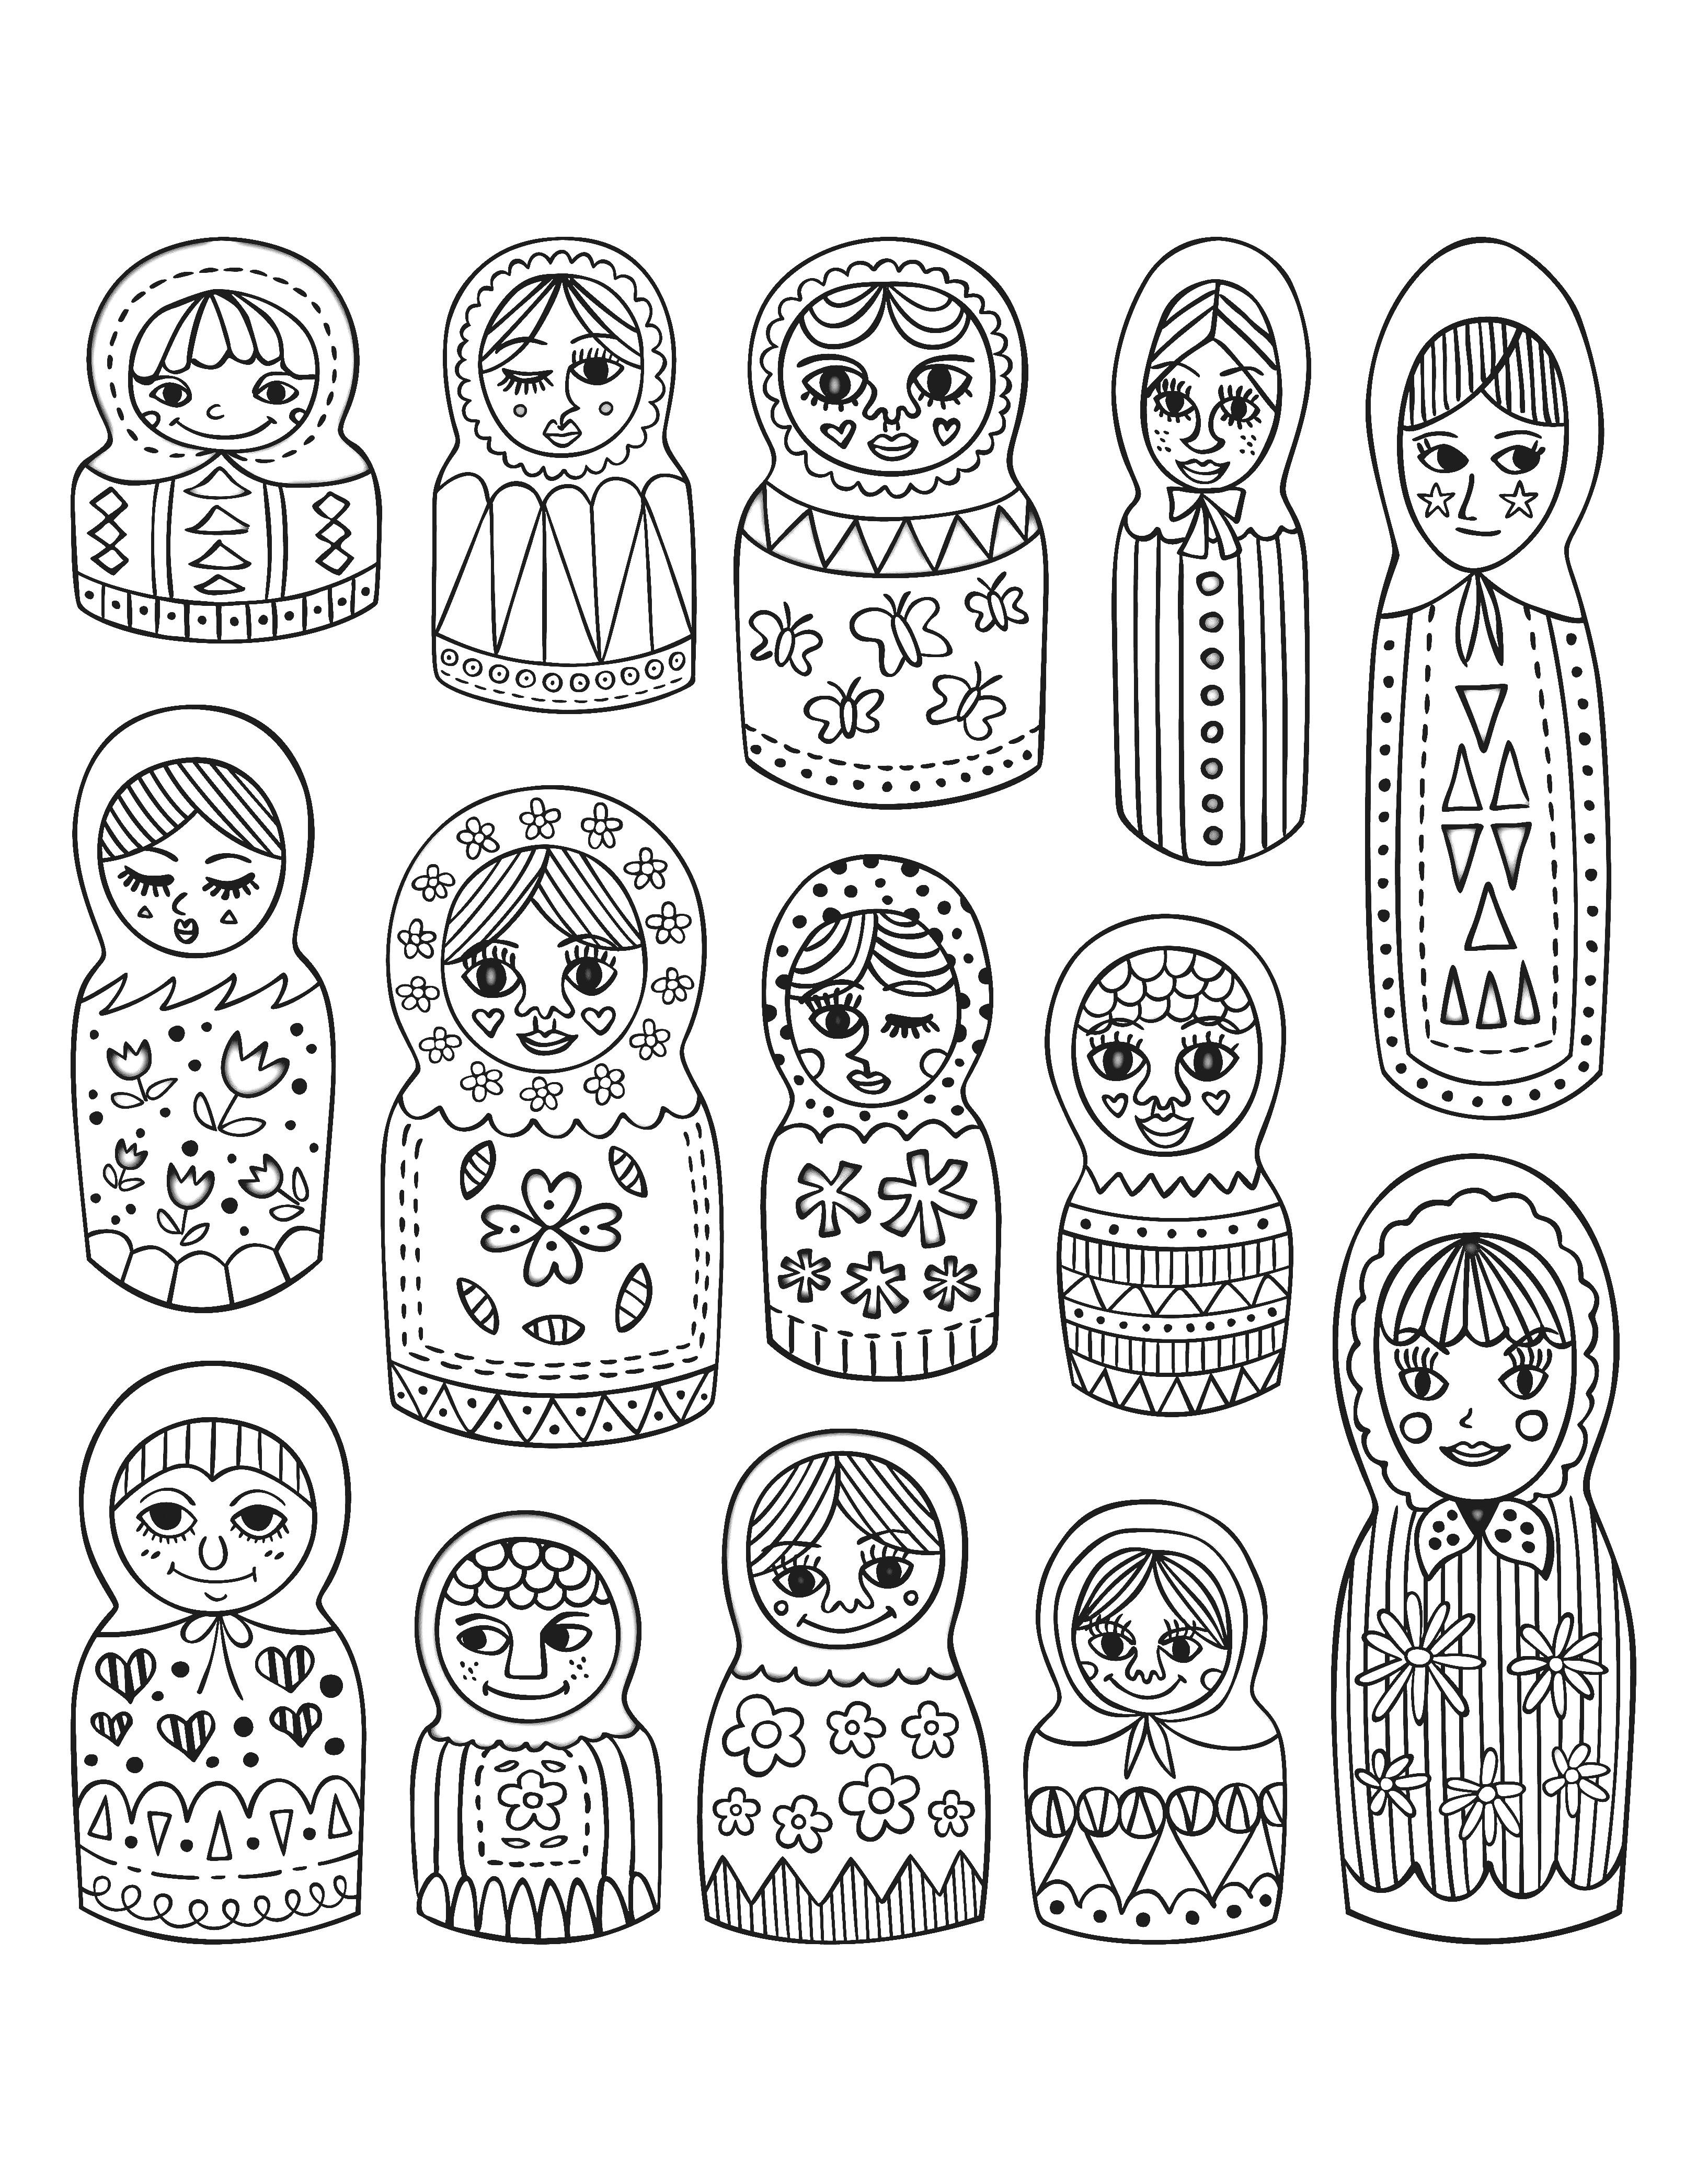 Bambole russe 10250